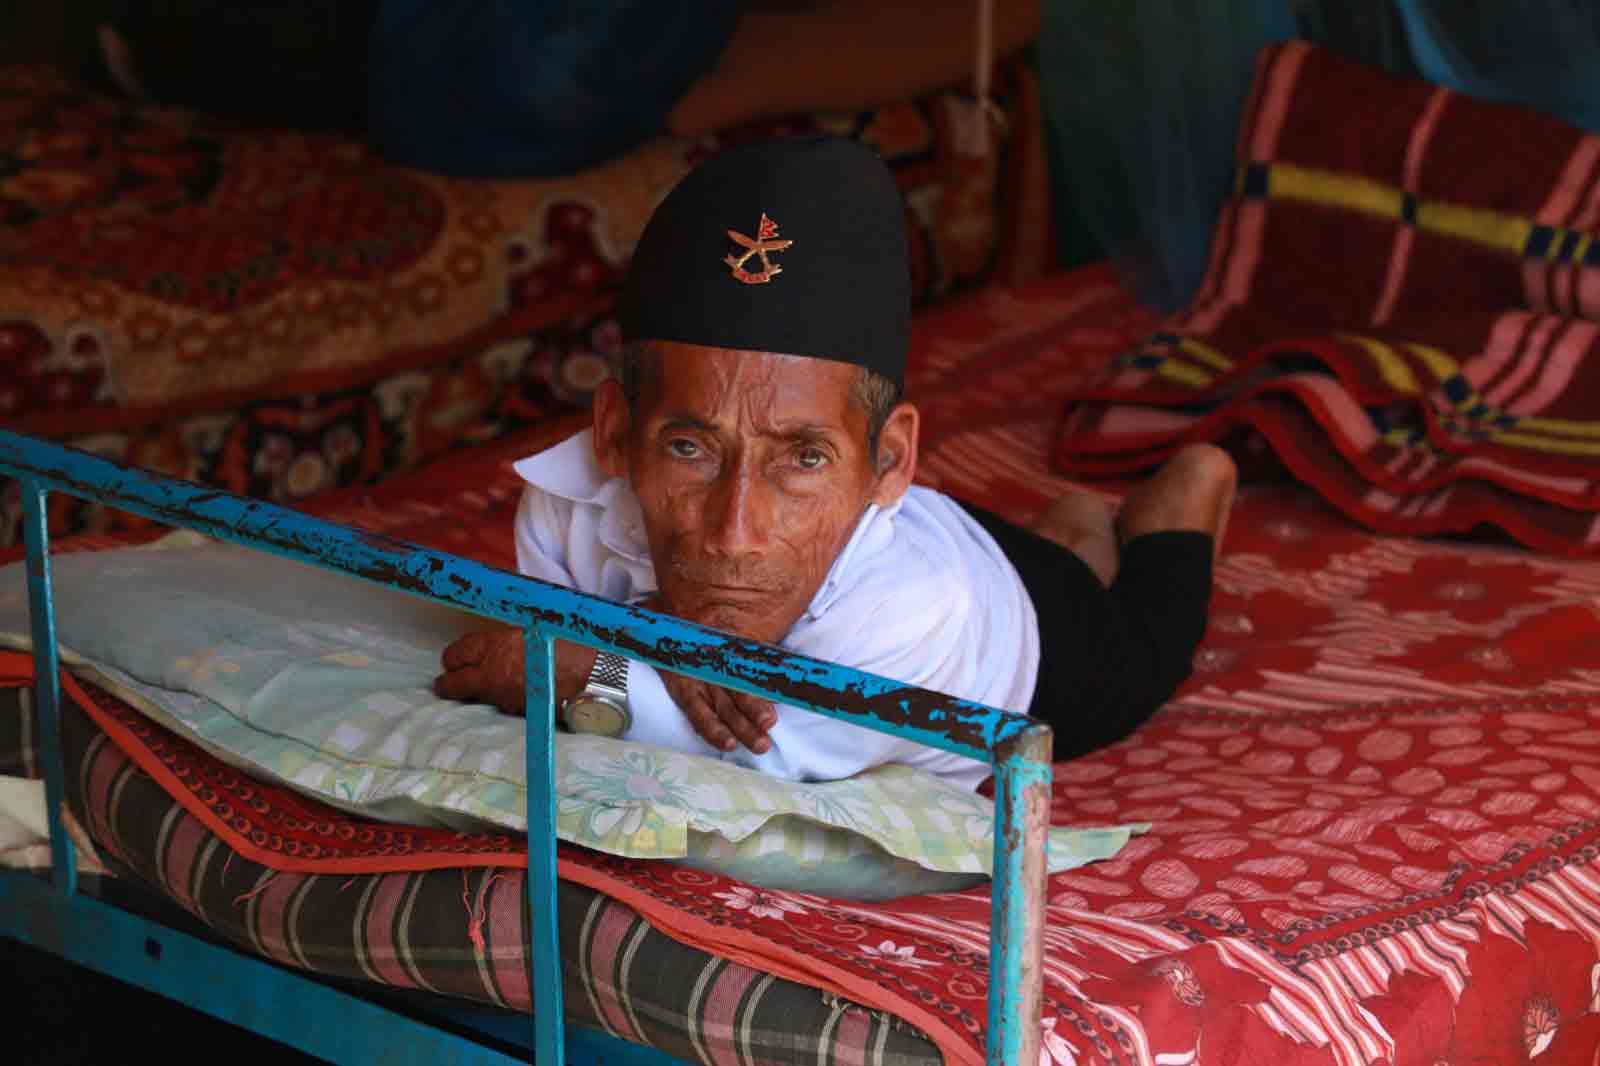 Chandra Bahadur Dangi, Nepal, Rambo Circus, Guinness World Record, Tupa'l Bruno's Magic Circus, Federation Mondiale du Cirque, Shortest man, tallest man, Nepal news, India news, Today in news, trending news, trending, news